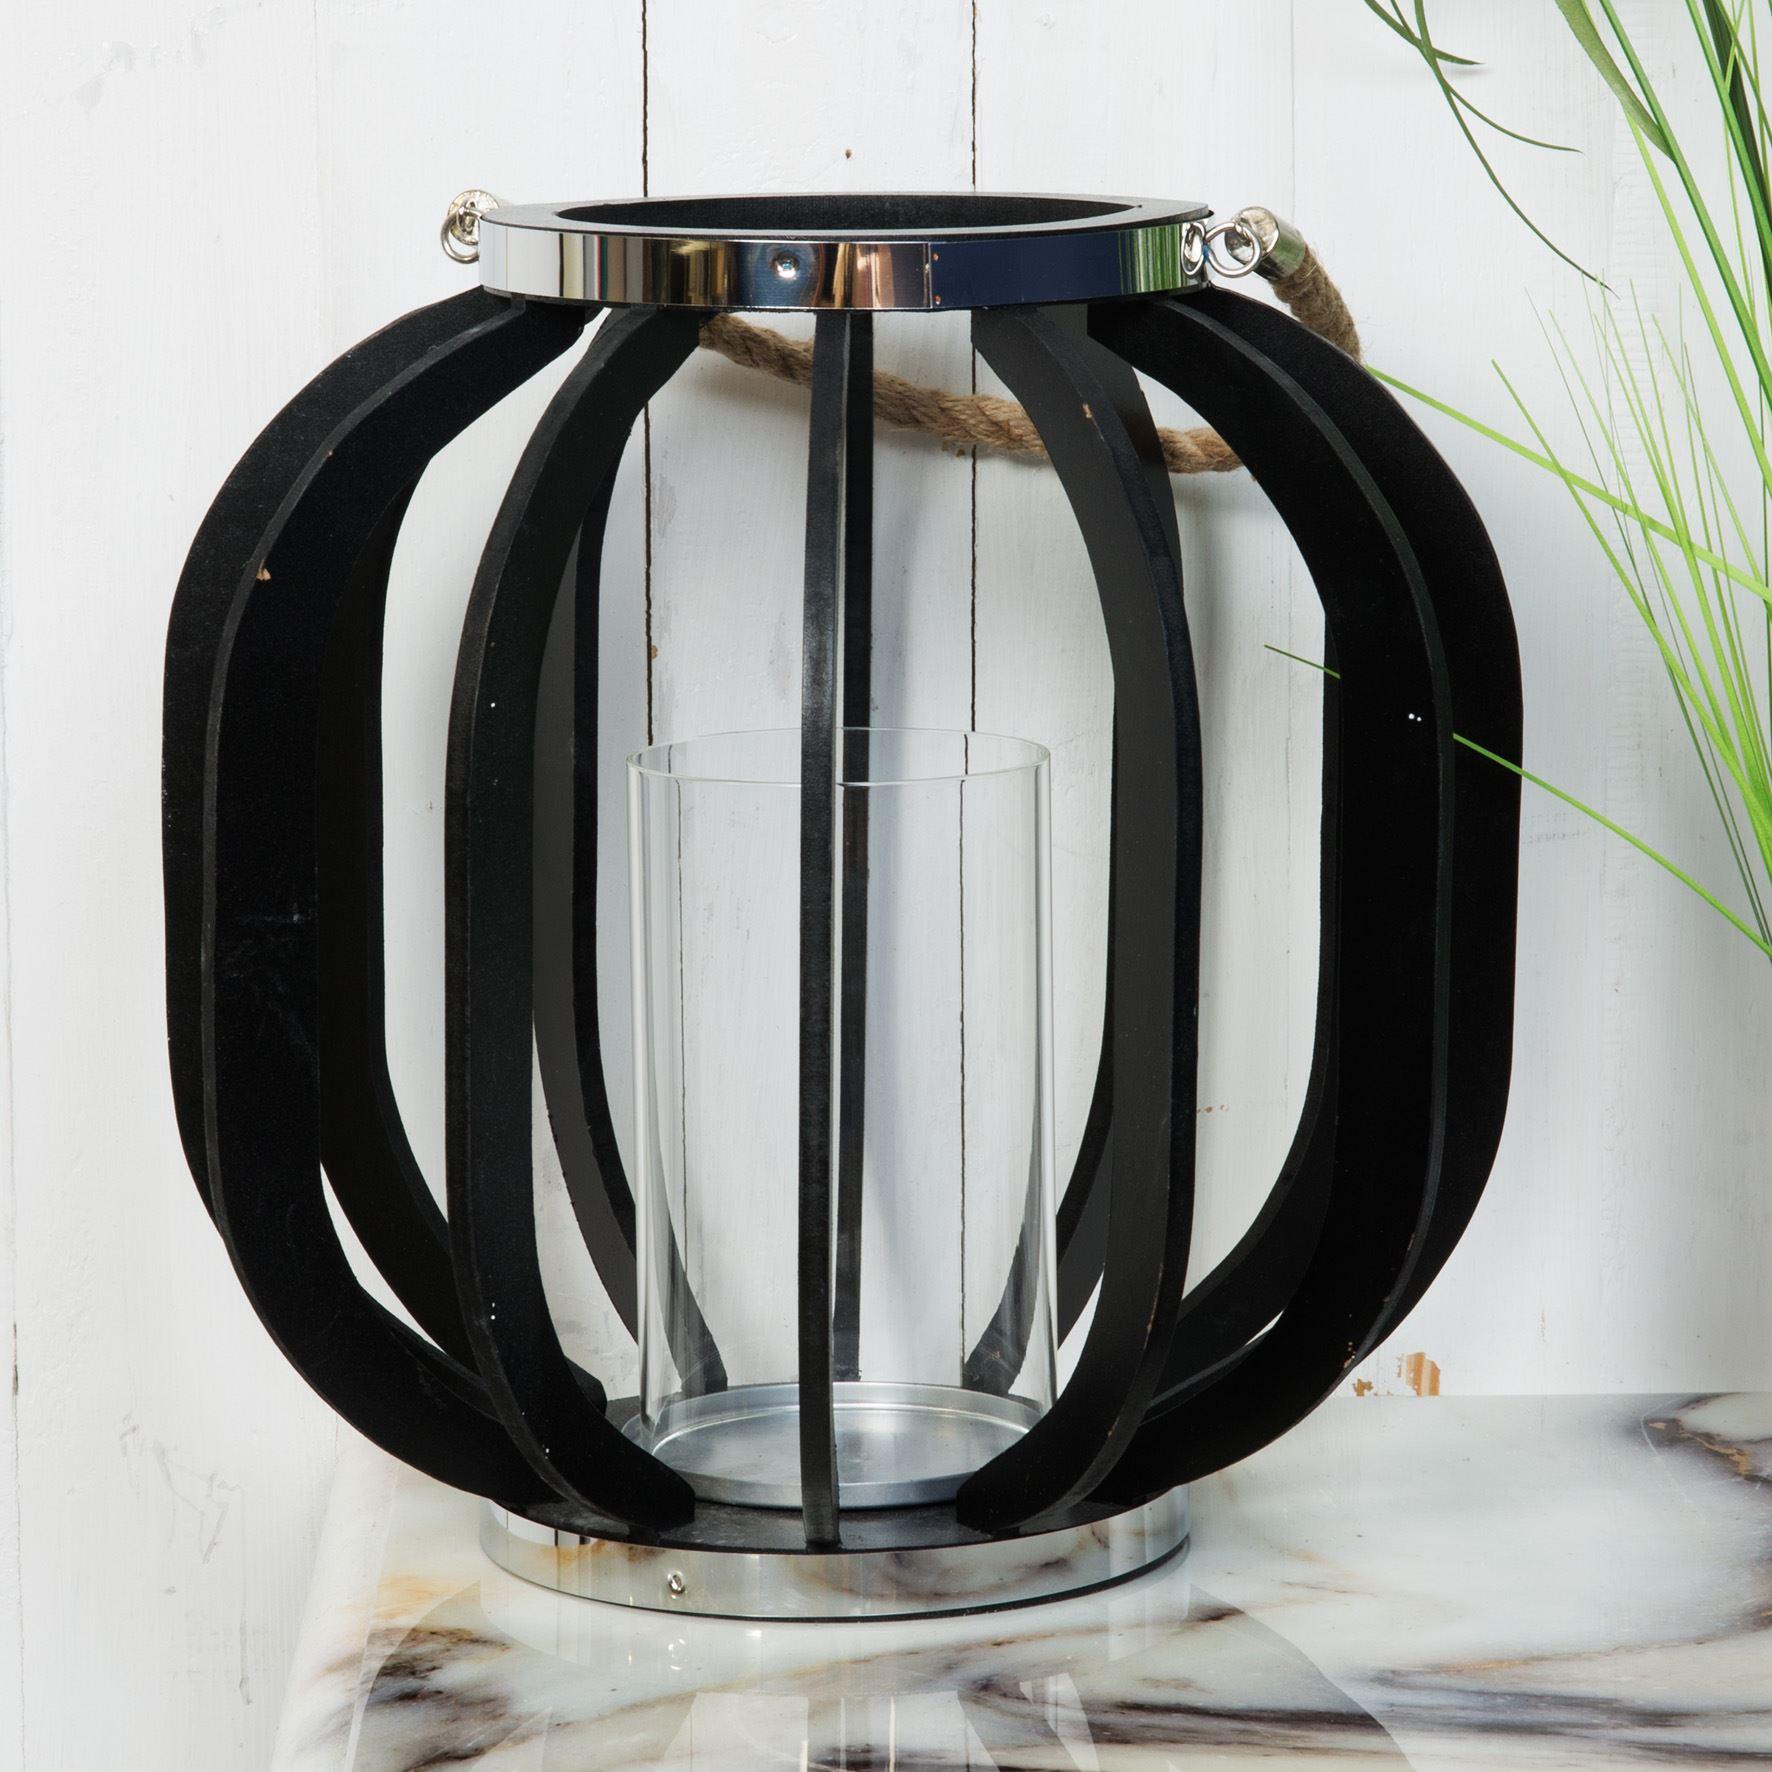 Hestia Metal & Black MDF Lantern 28.5cm - Hestia